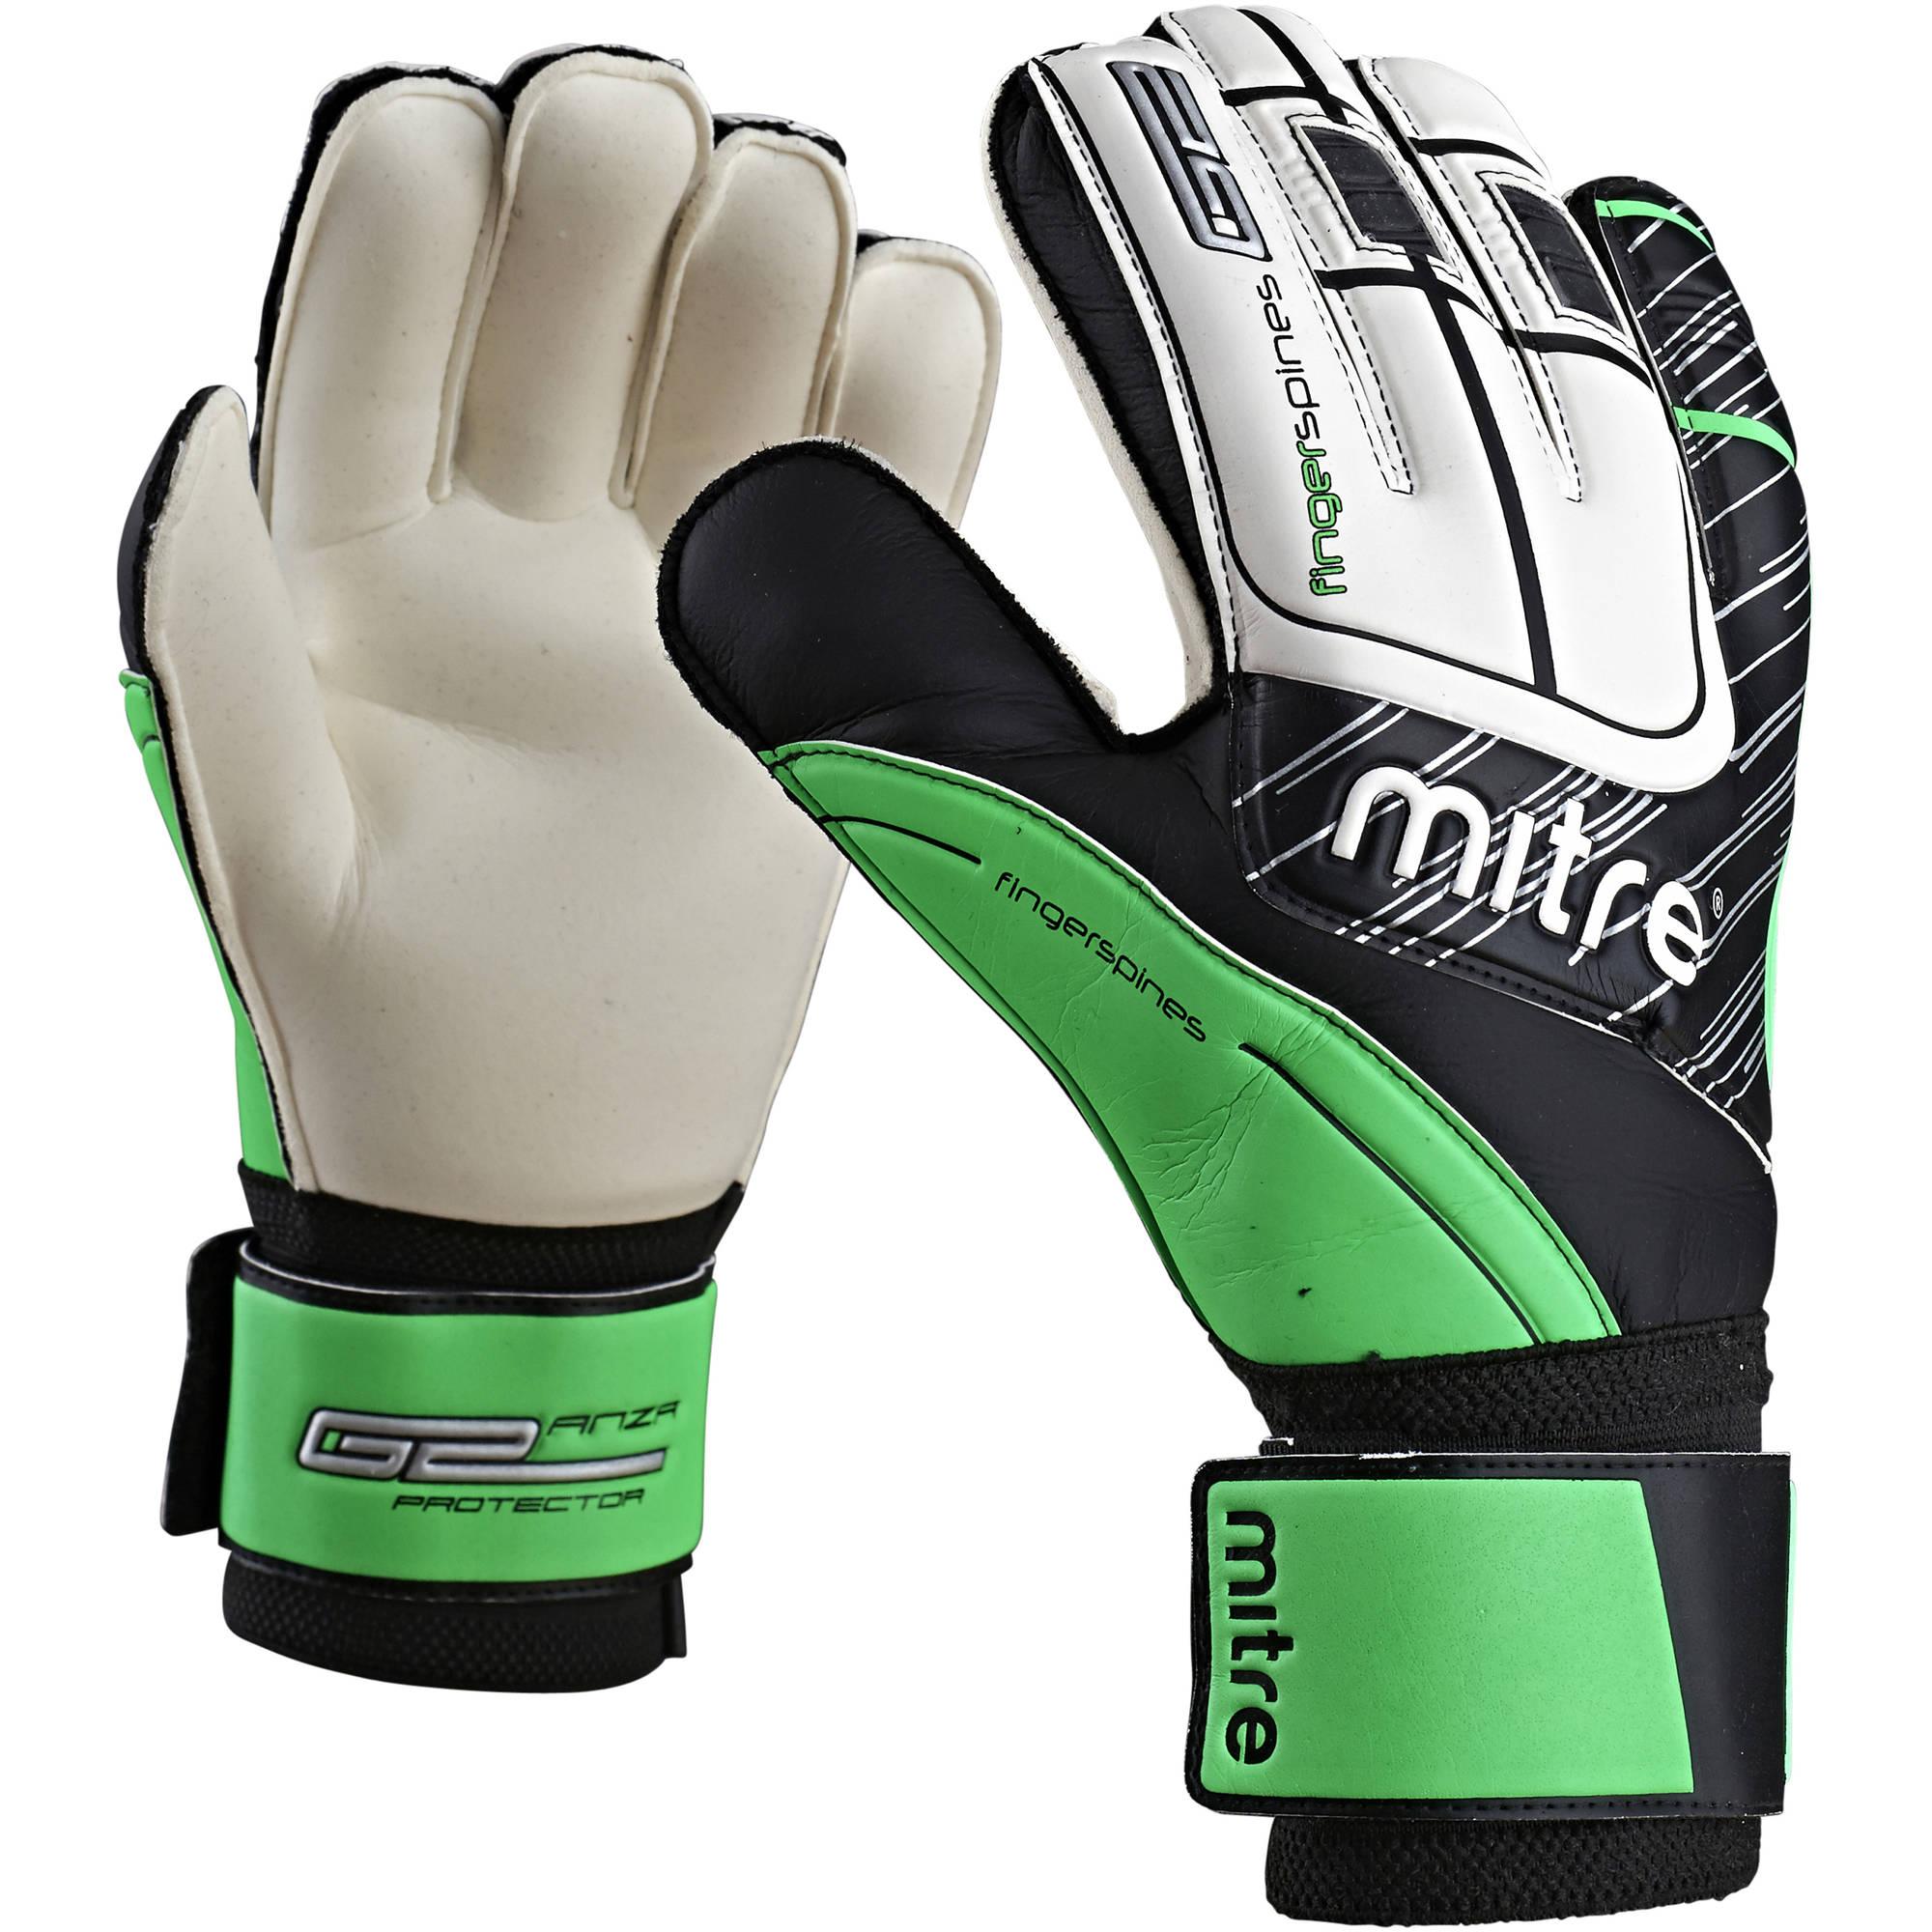 Mitre Anza G2 Protector Goalie Gloves